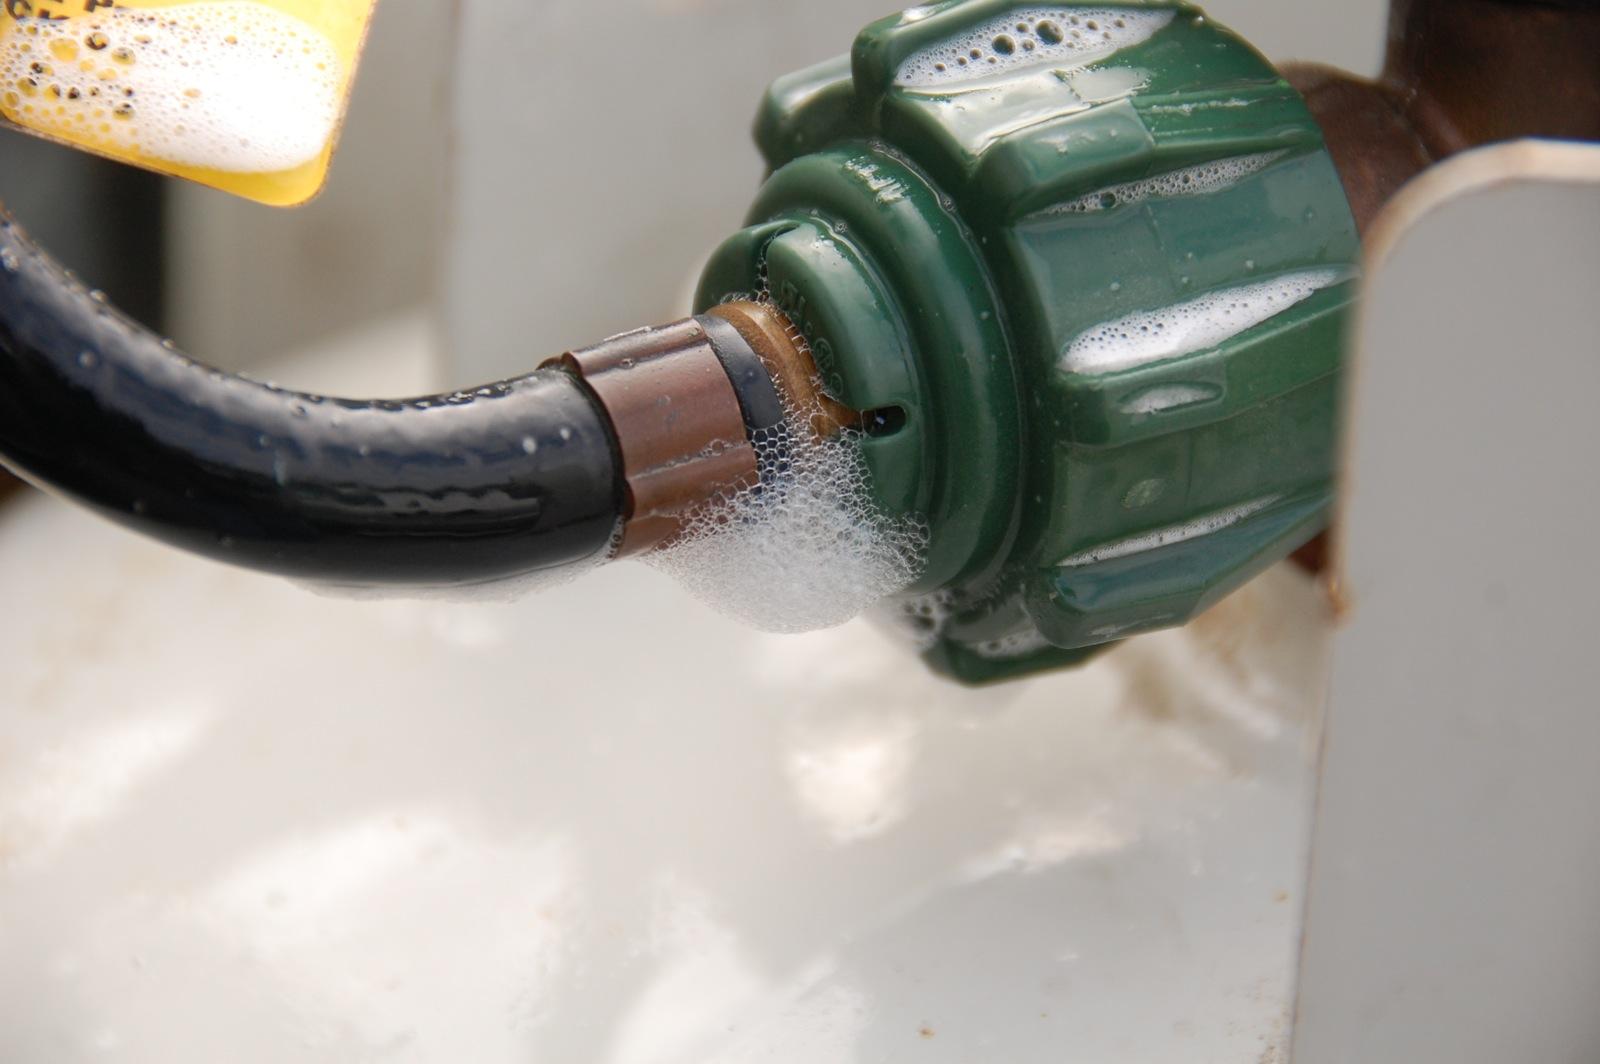 Click image for larger version  Name:DSC_0454 Pigtail hose leak.jpg Views:59 Size:231.1 KB ID:246045